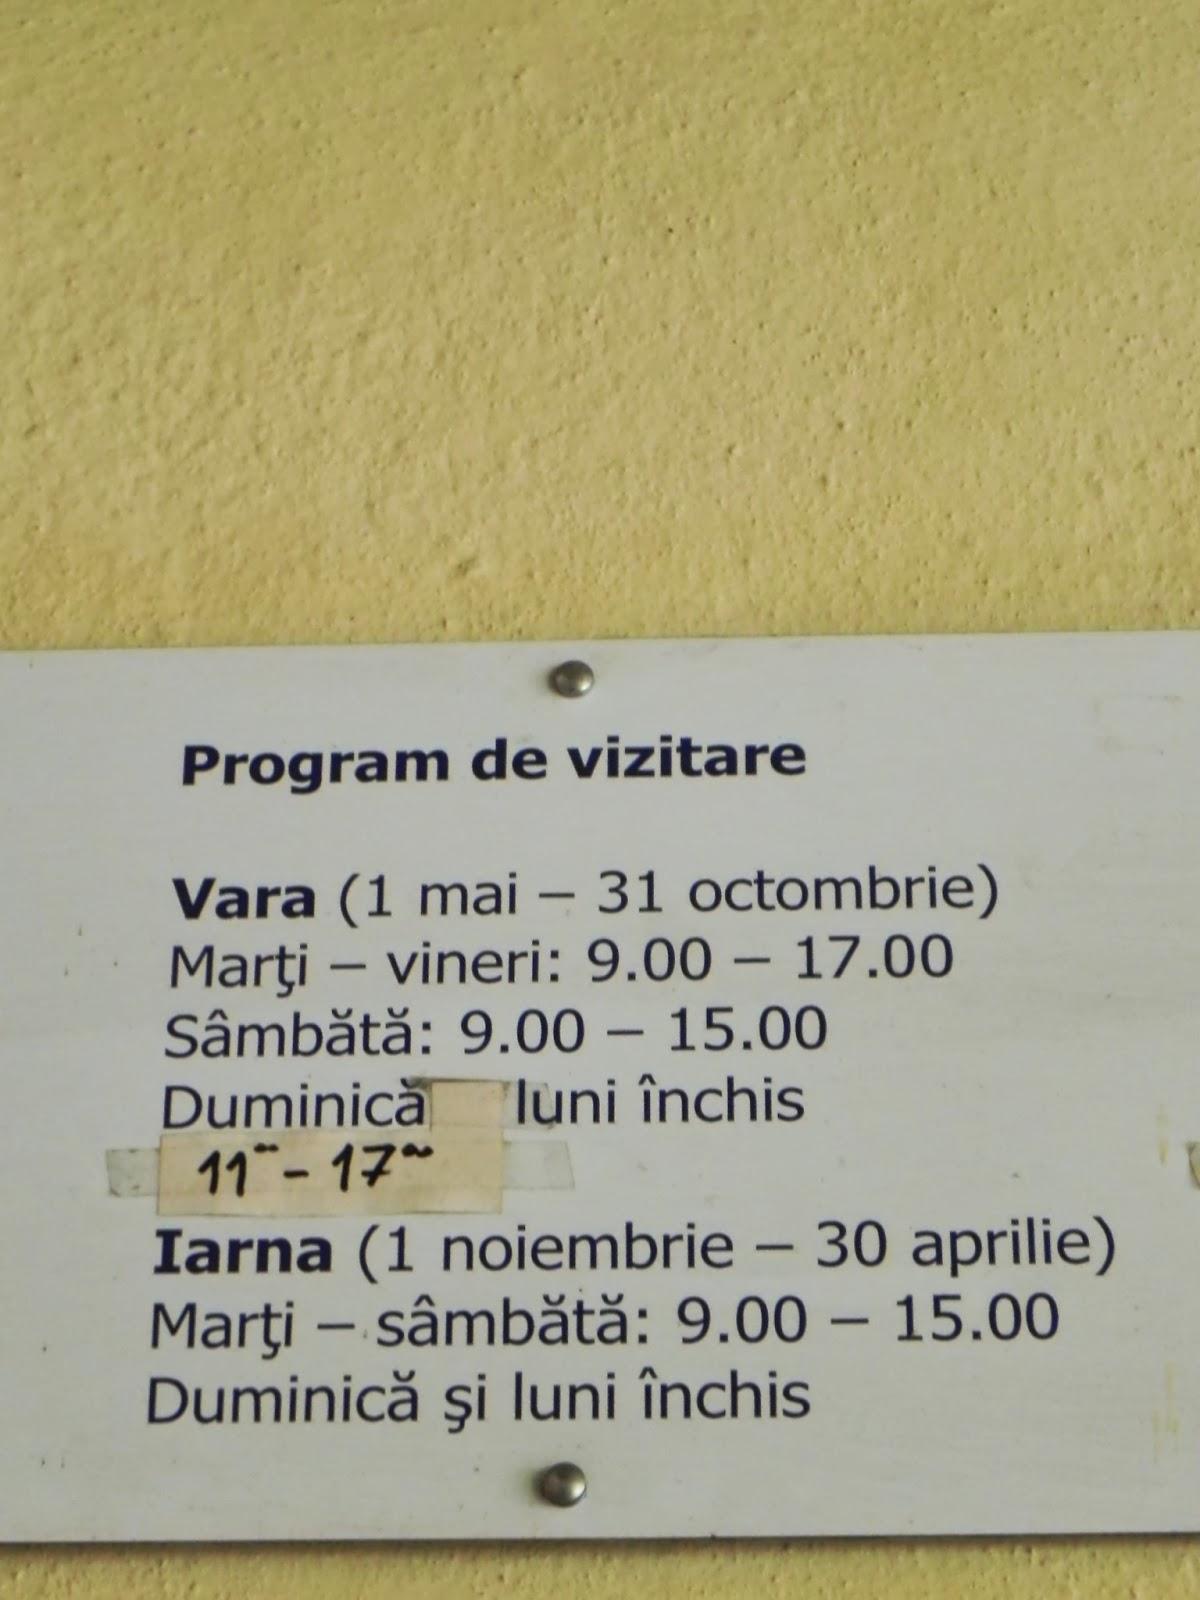 Programul de vizitare al cetatii Prejmer